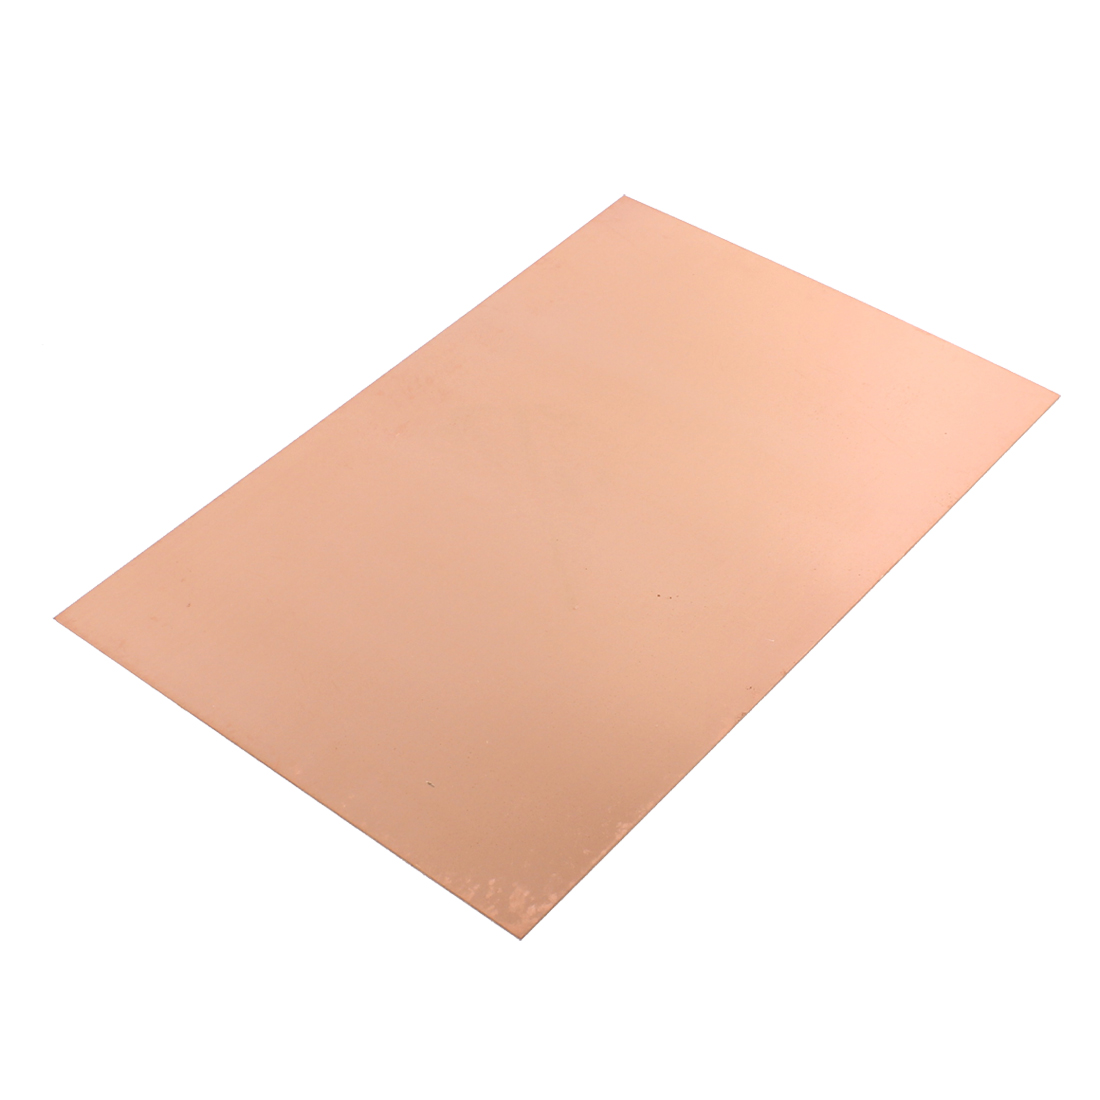 Copper Clad Cover Single Side PCB Printed Circuit Board 30cm x 20cm